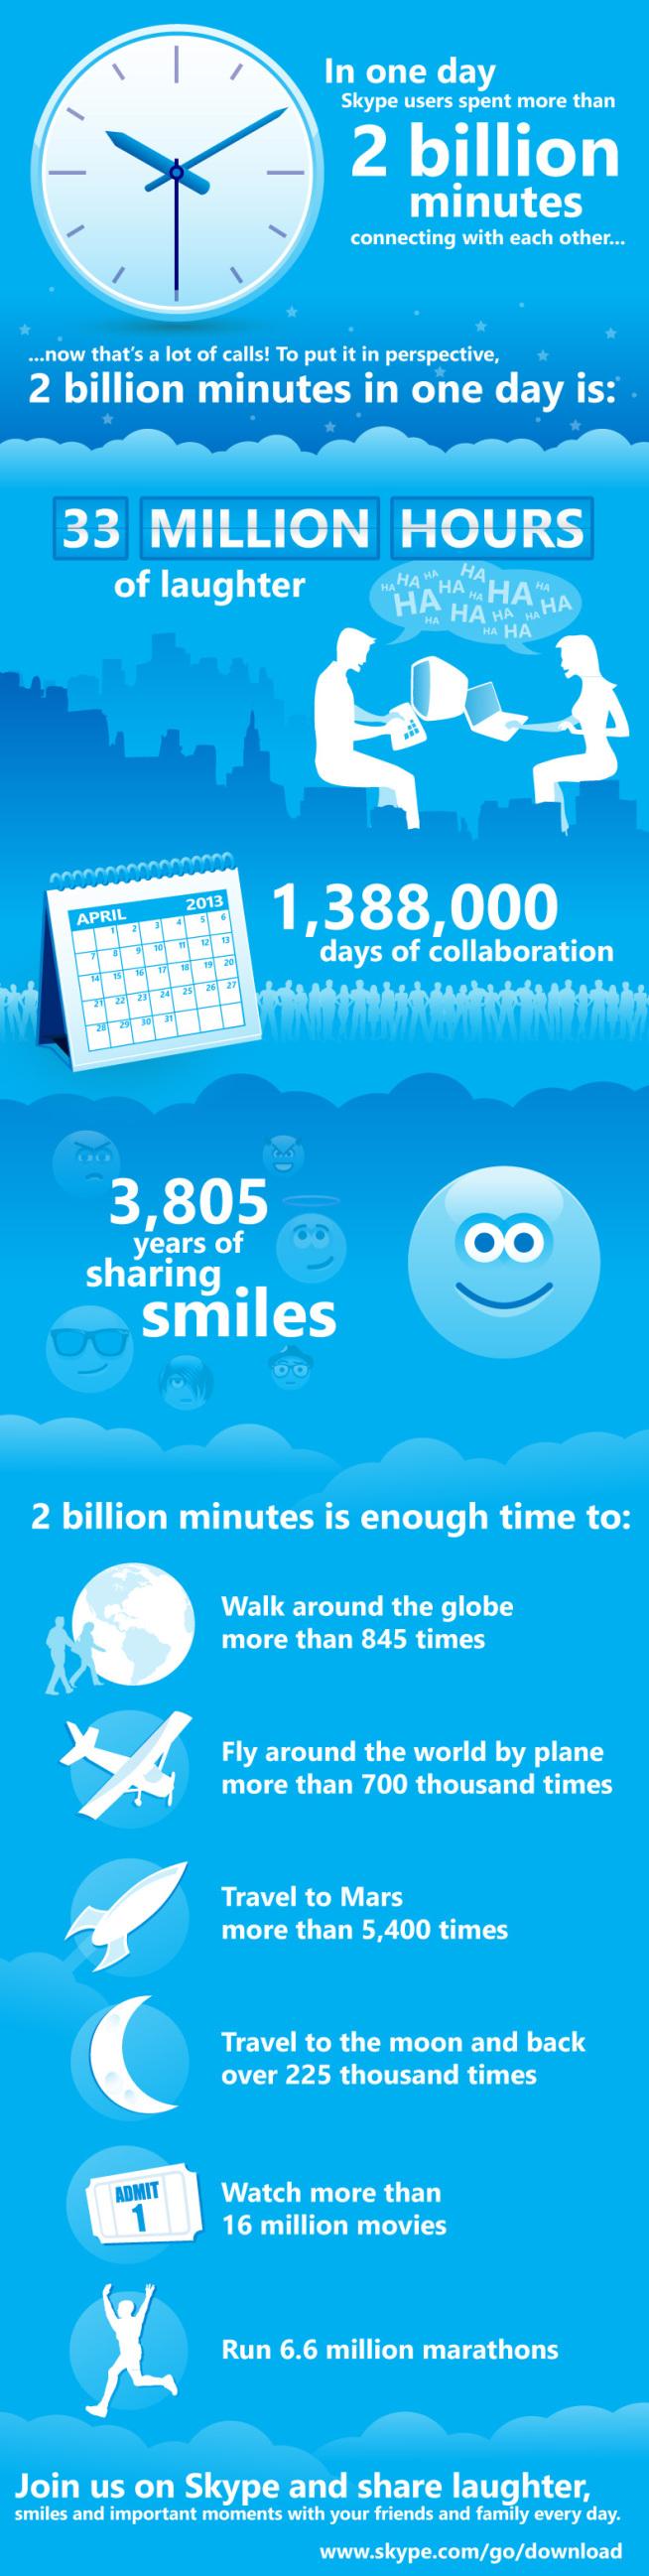 Skype users hit milestone 2 billion minute per day